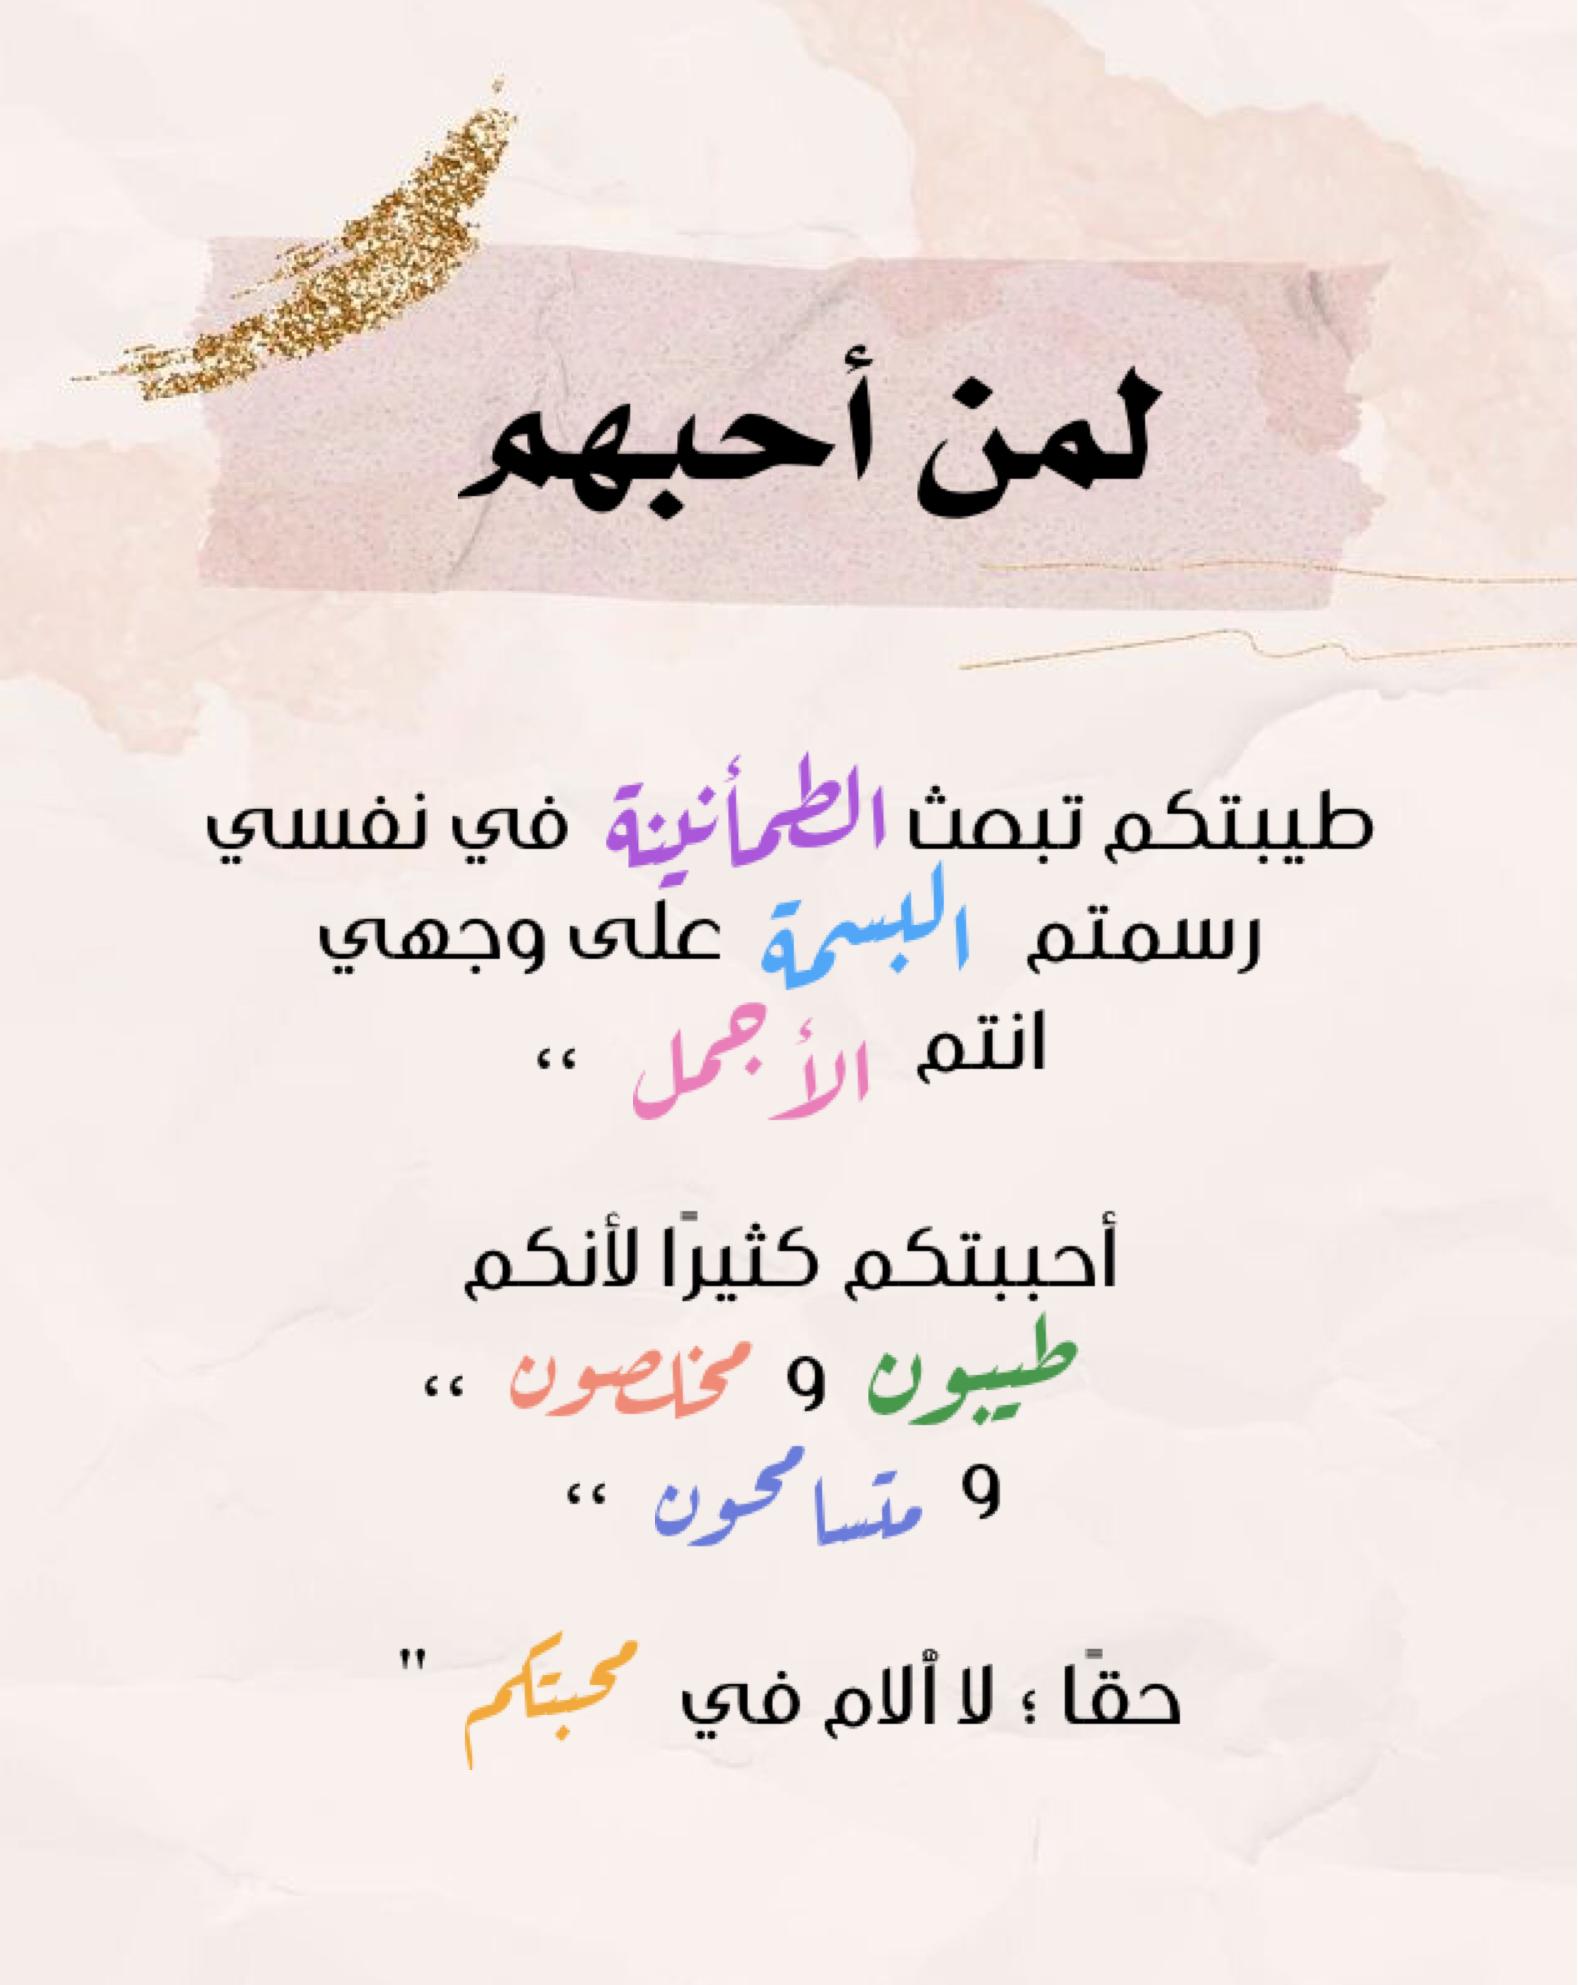 Pin By دوسريه On انقى الحروف Calligraphy Arabic Calligraphy Arabic